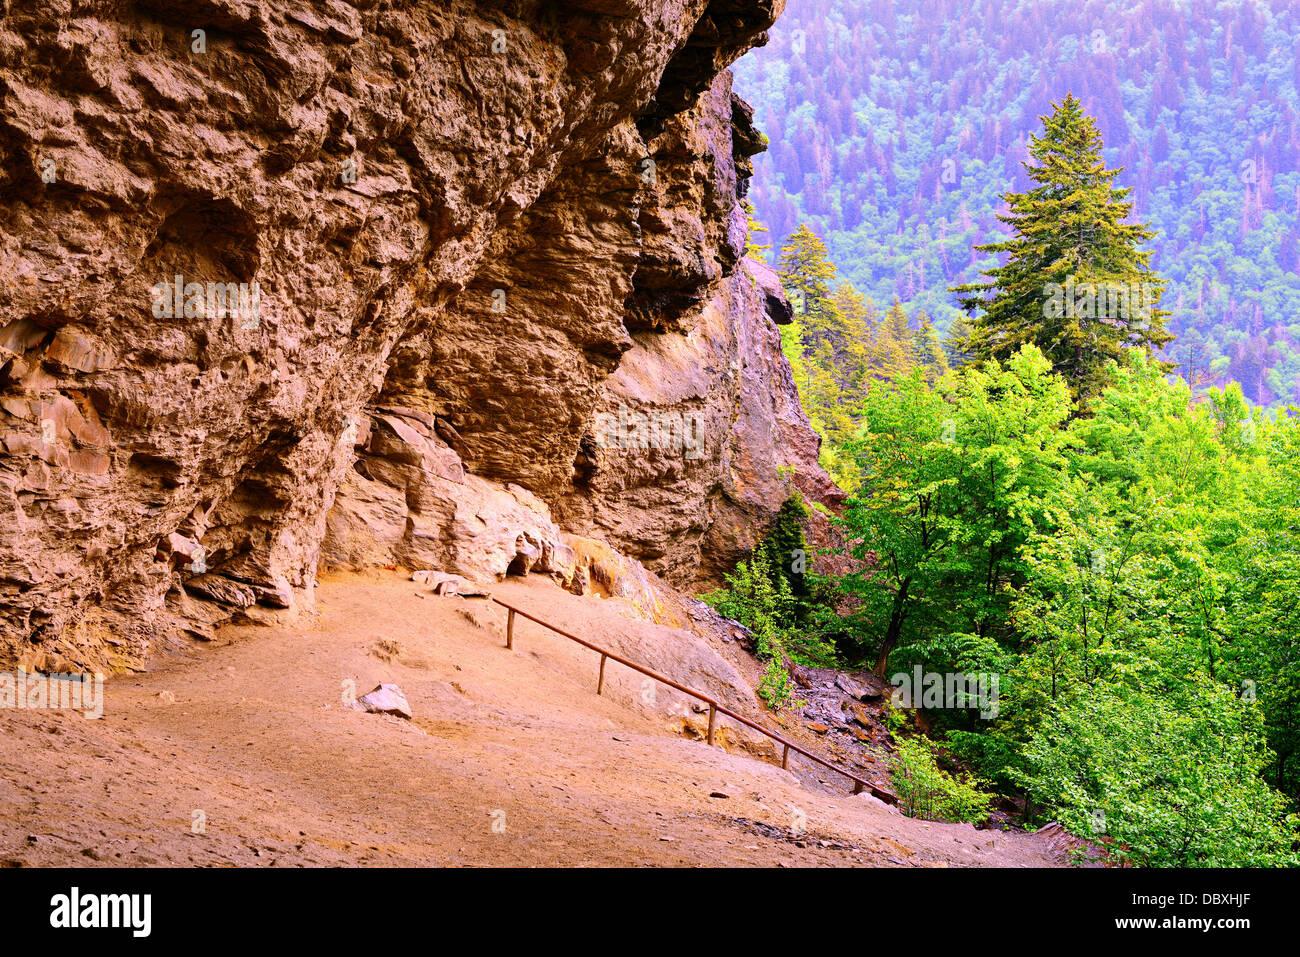 Cueva de alumbre en el Great Smoky Mountains National Forest. Imagen De Stock